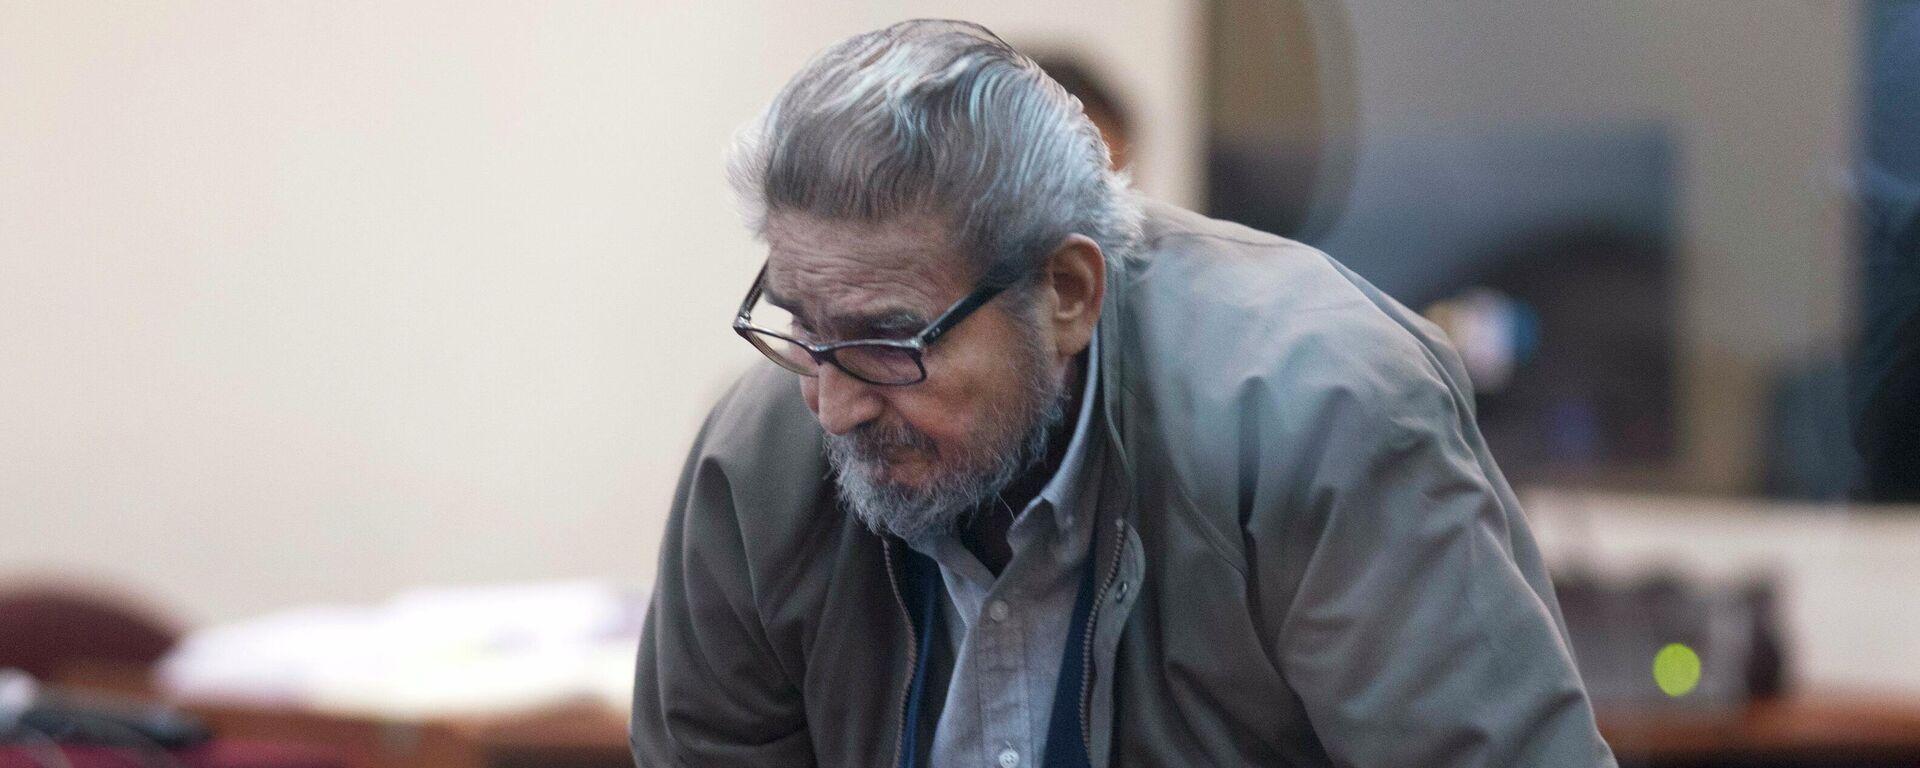 Abimael Guzmán, líder de la organización terrorista peruana Sendero Luminoso  - Sputnik Mundo, 1920, 11.09.2021